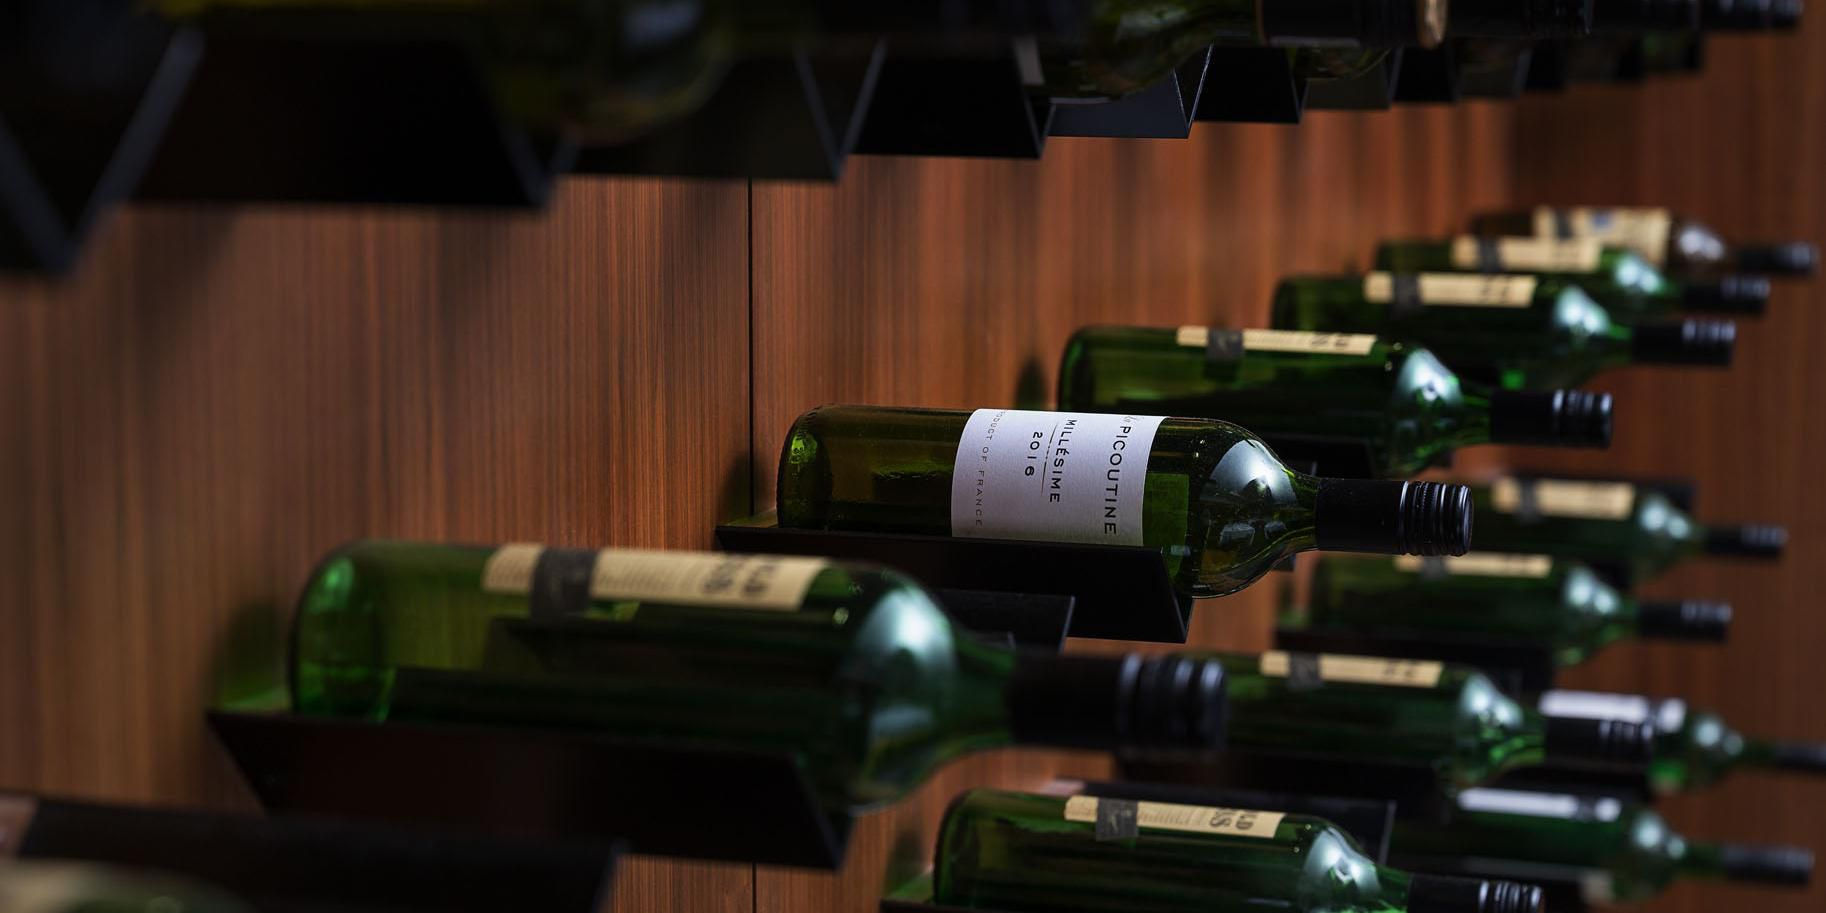 Cilantro wine cellar